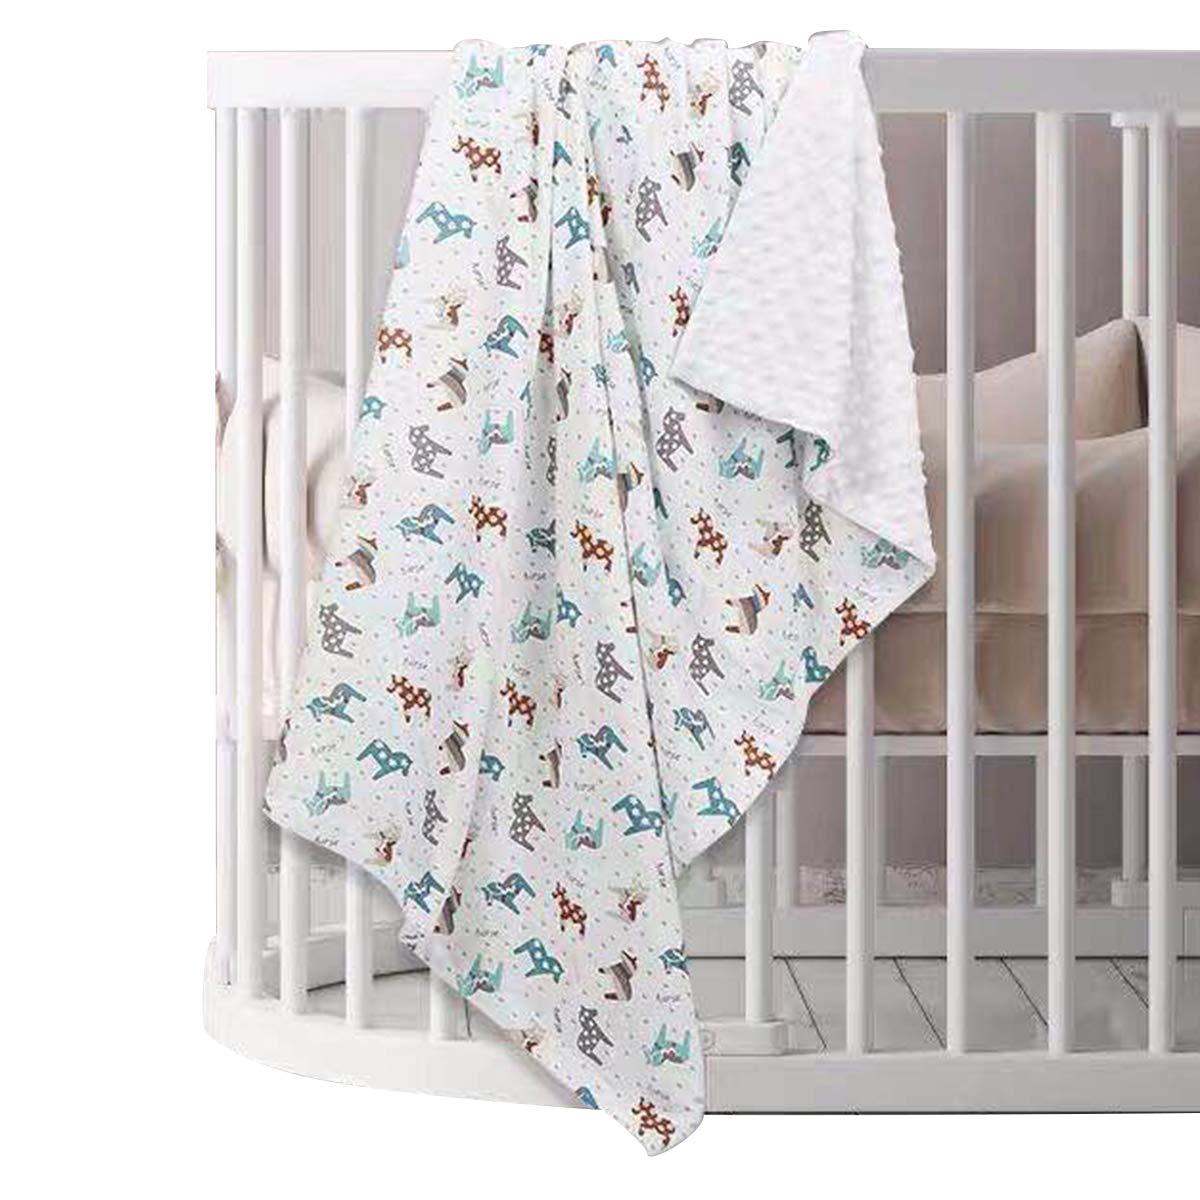 puseky Newborn Baby Bed Blanket, Infant Toddler Lightweight Soft Warm Blanket Crib Stroller Blanket 110x75cm